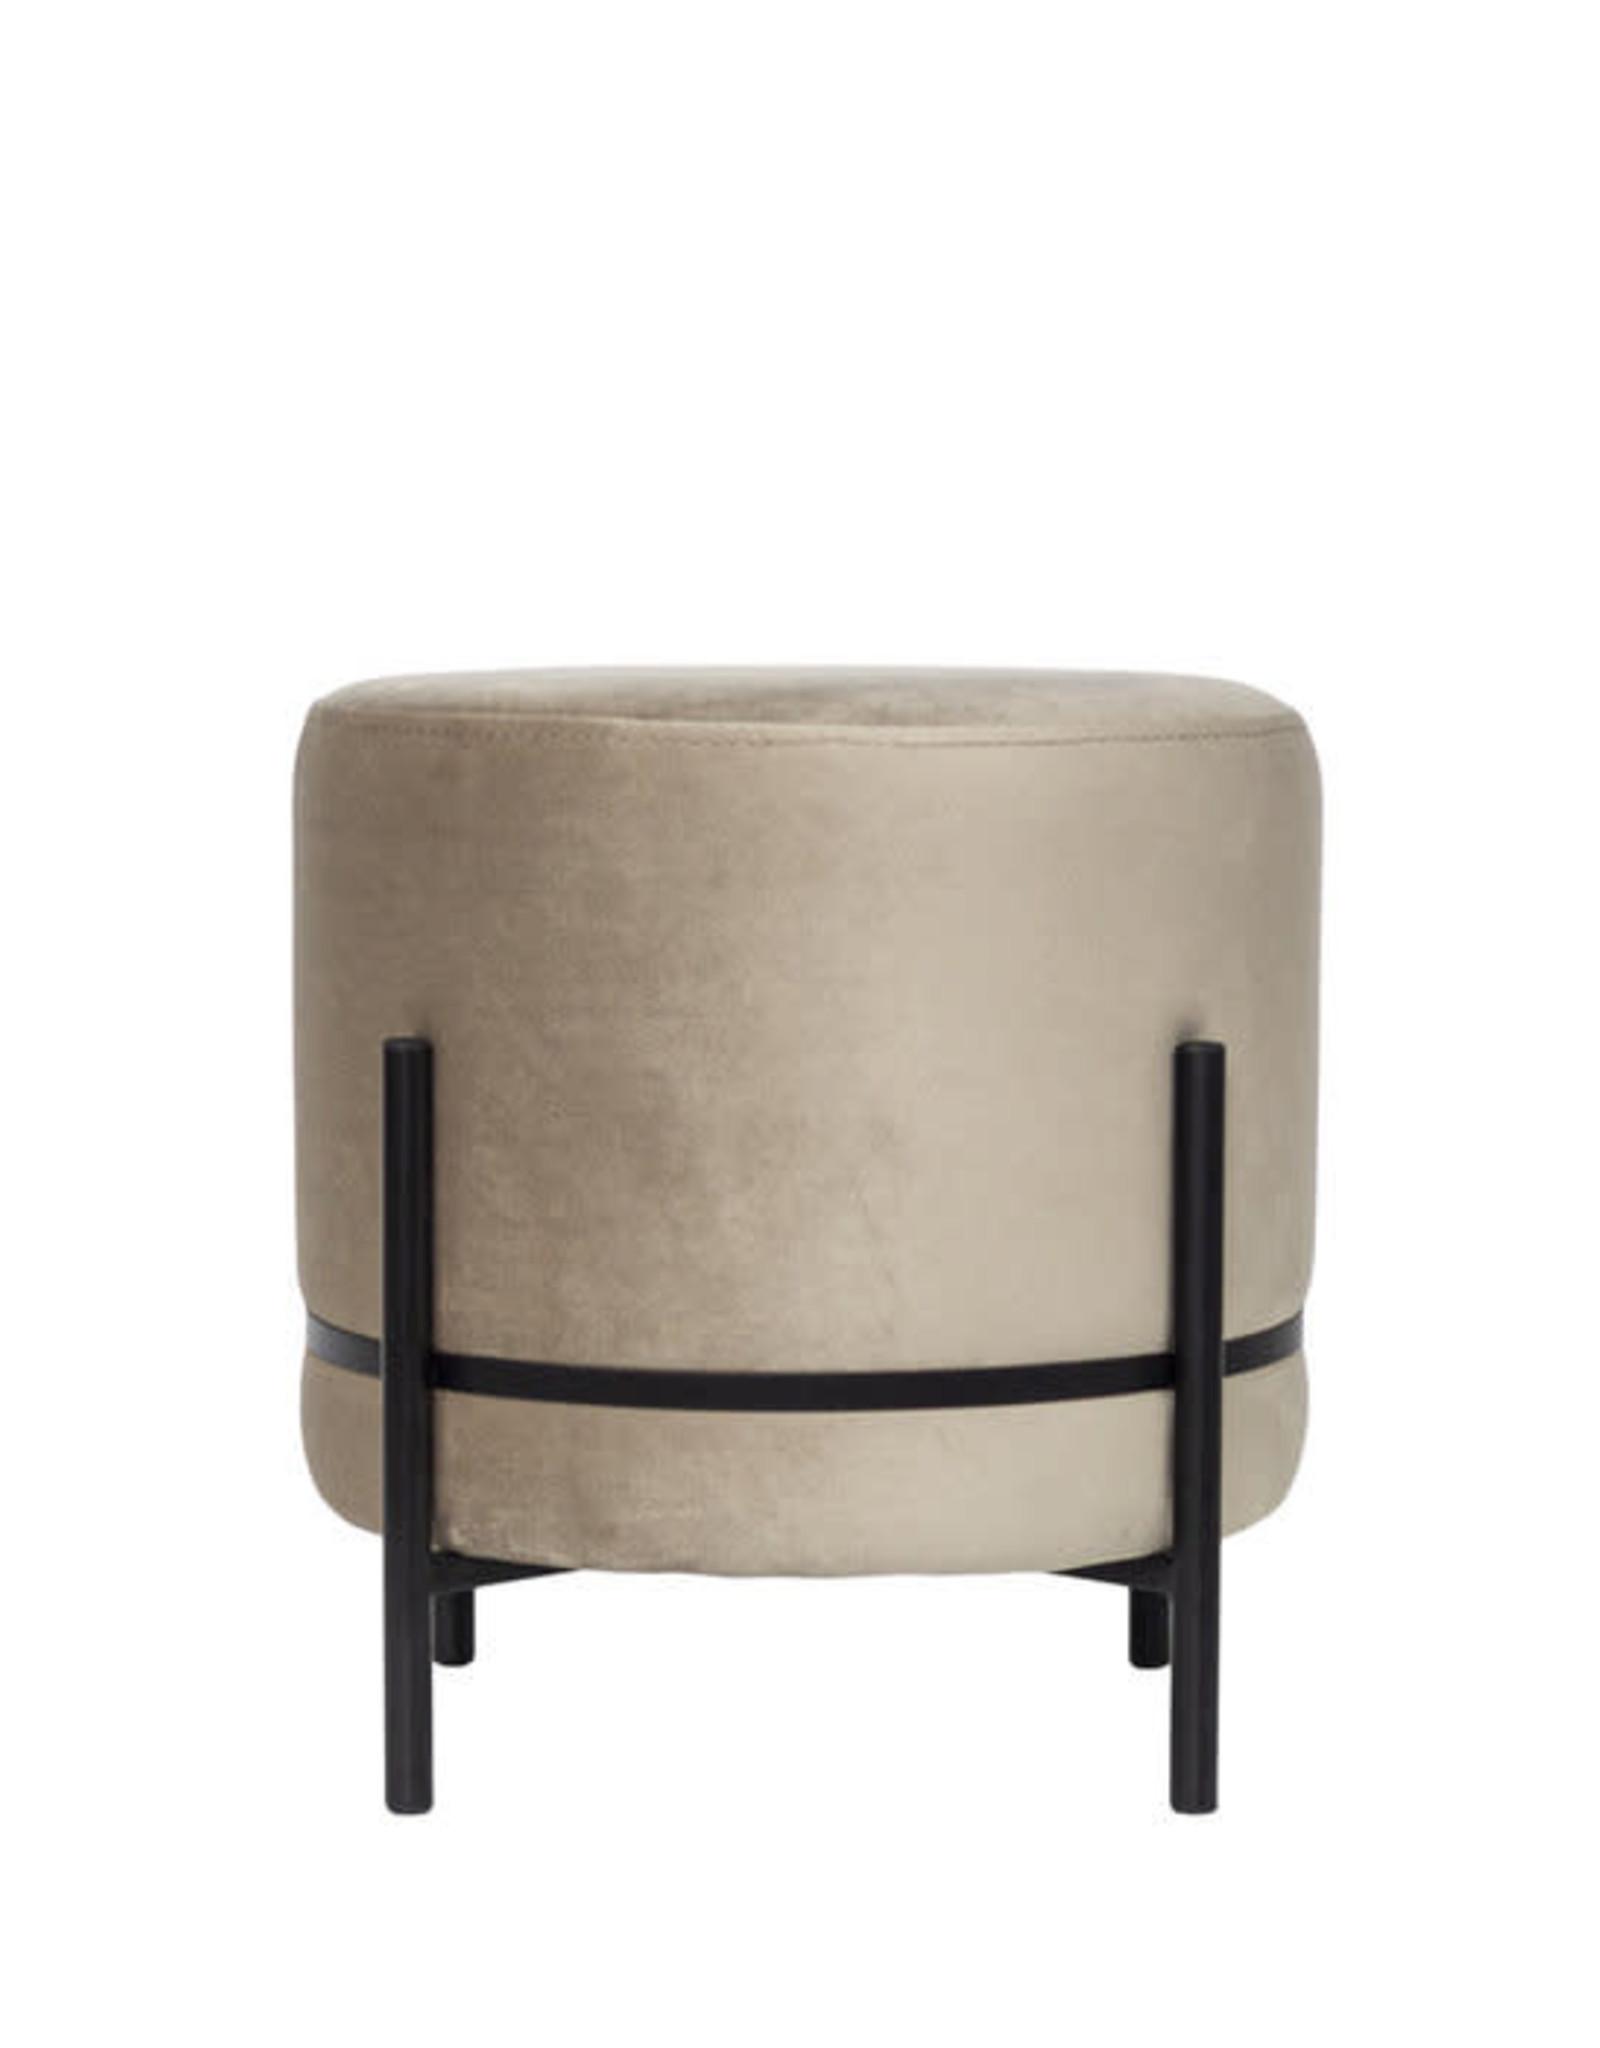 Dome Deco Dome Deco - Baba stool on stand - Paris velvet